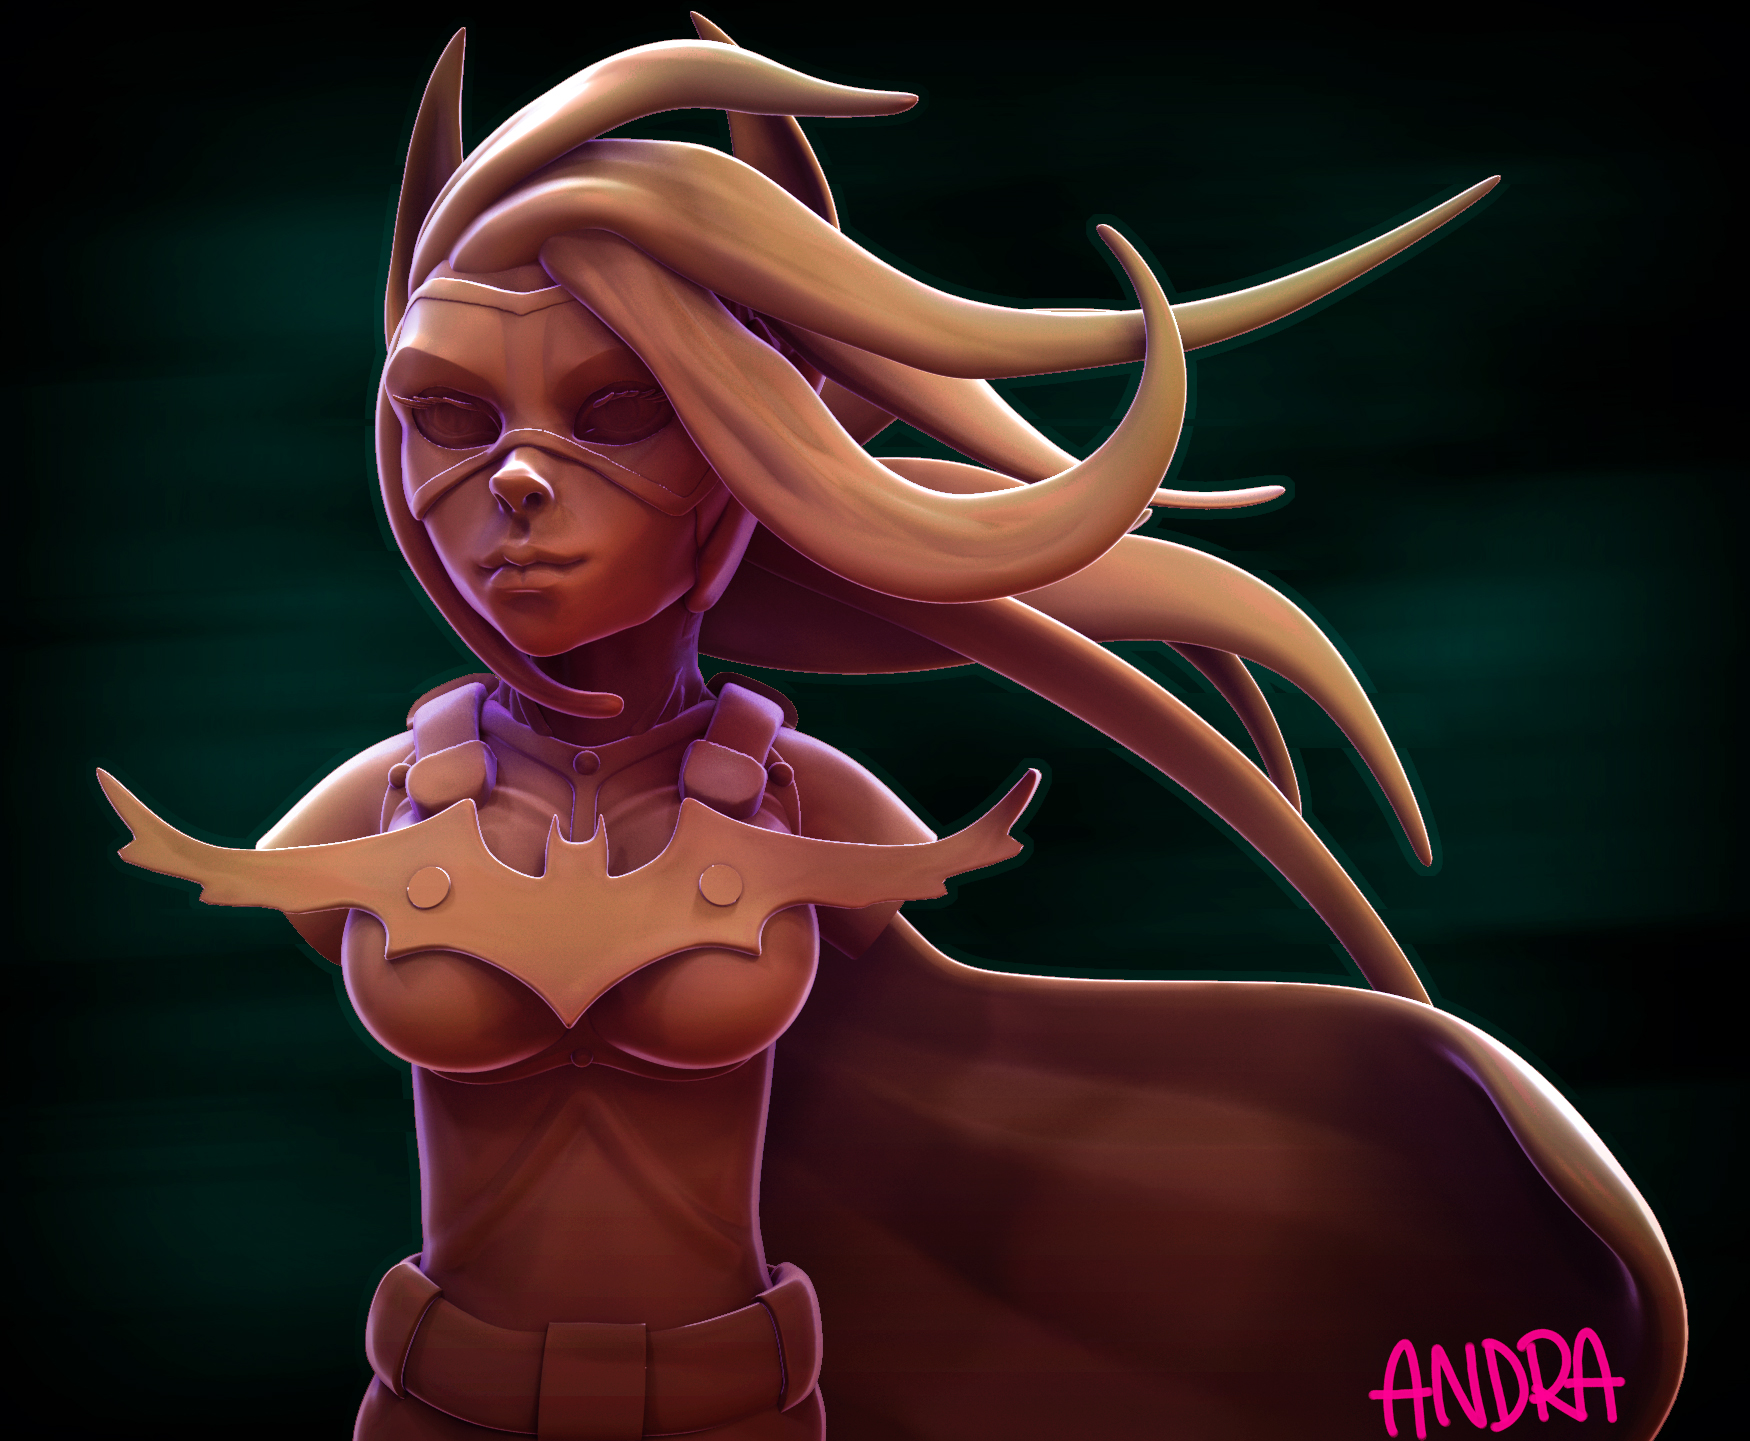 batgirl_bust_by_andra_arts-d7cy1cn.jpg